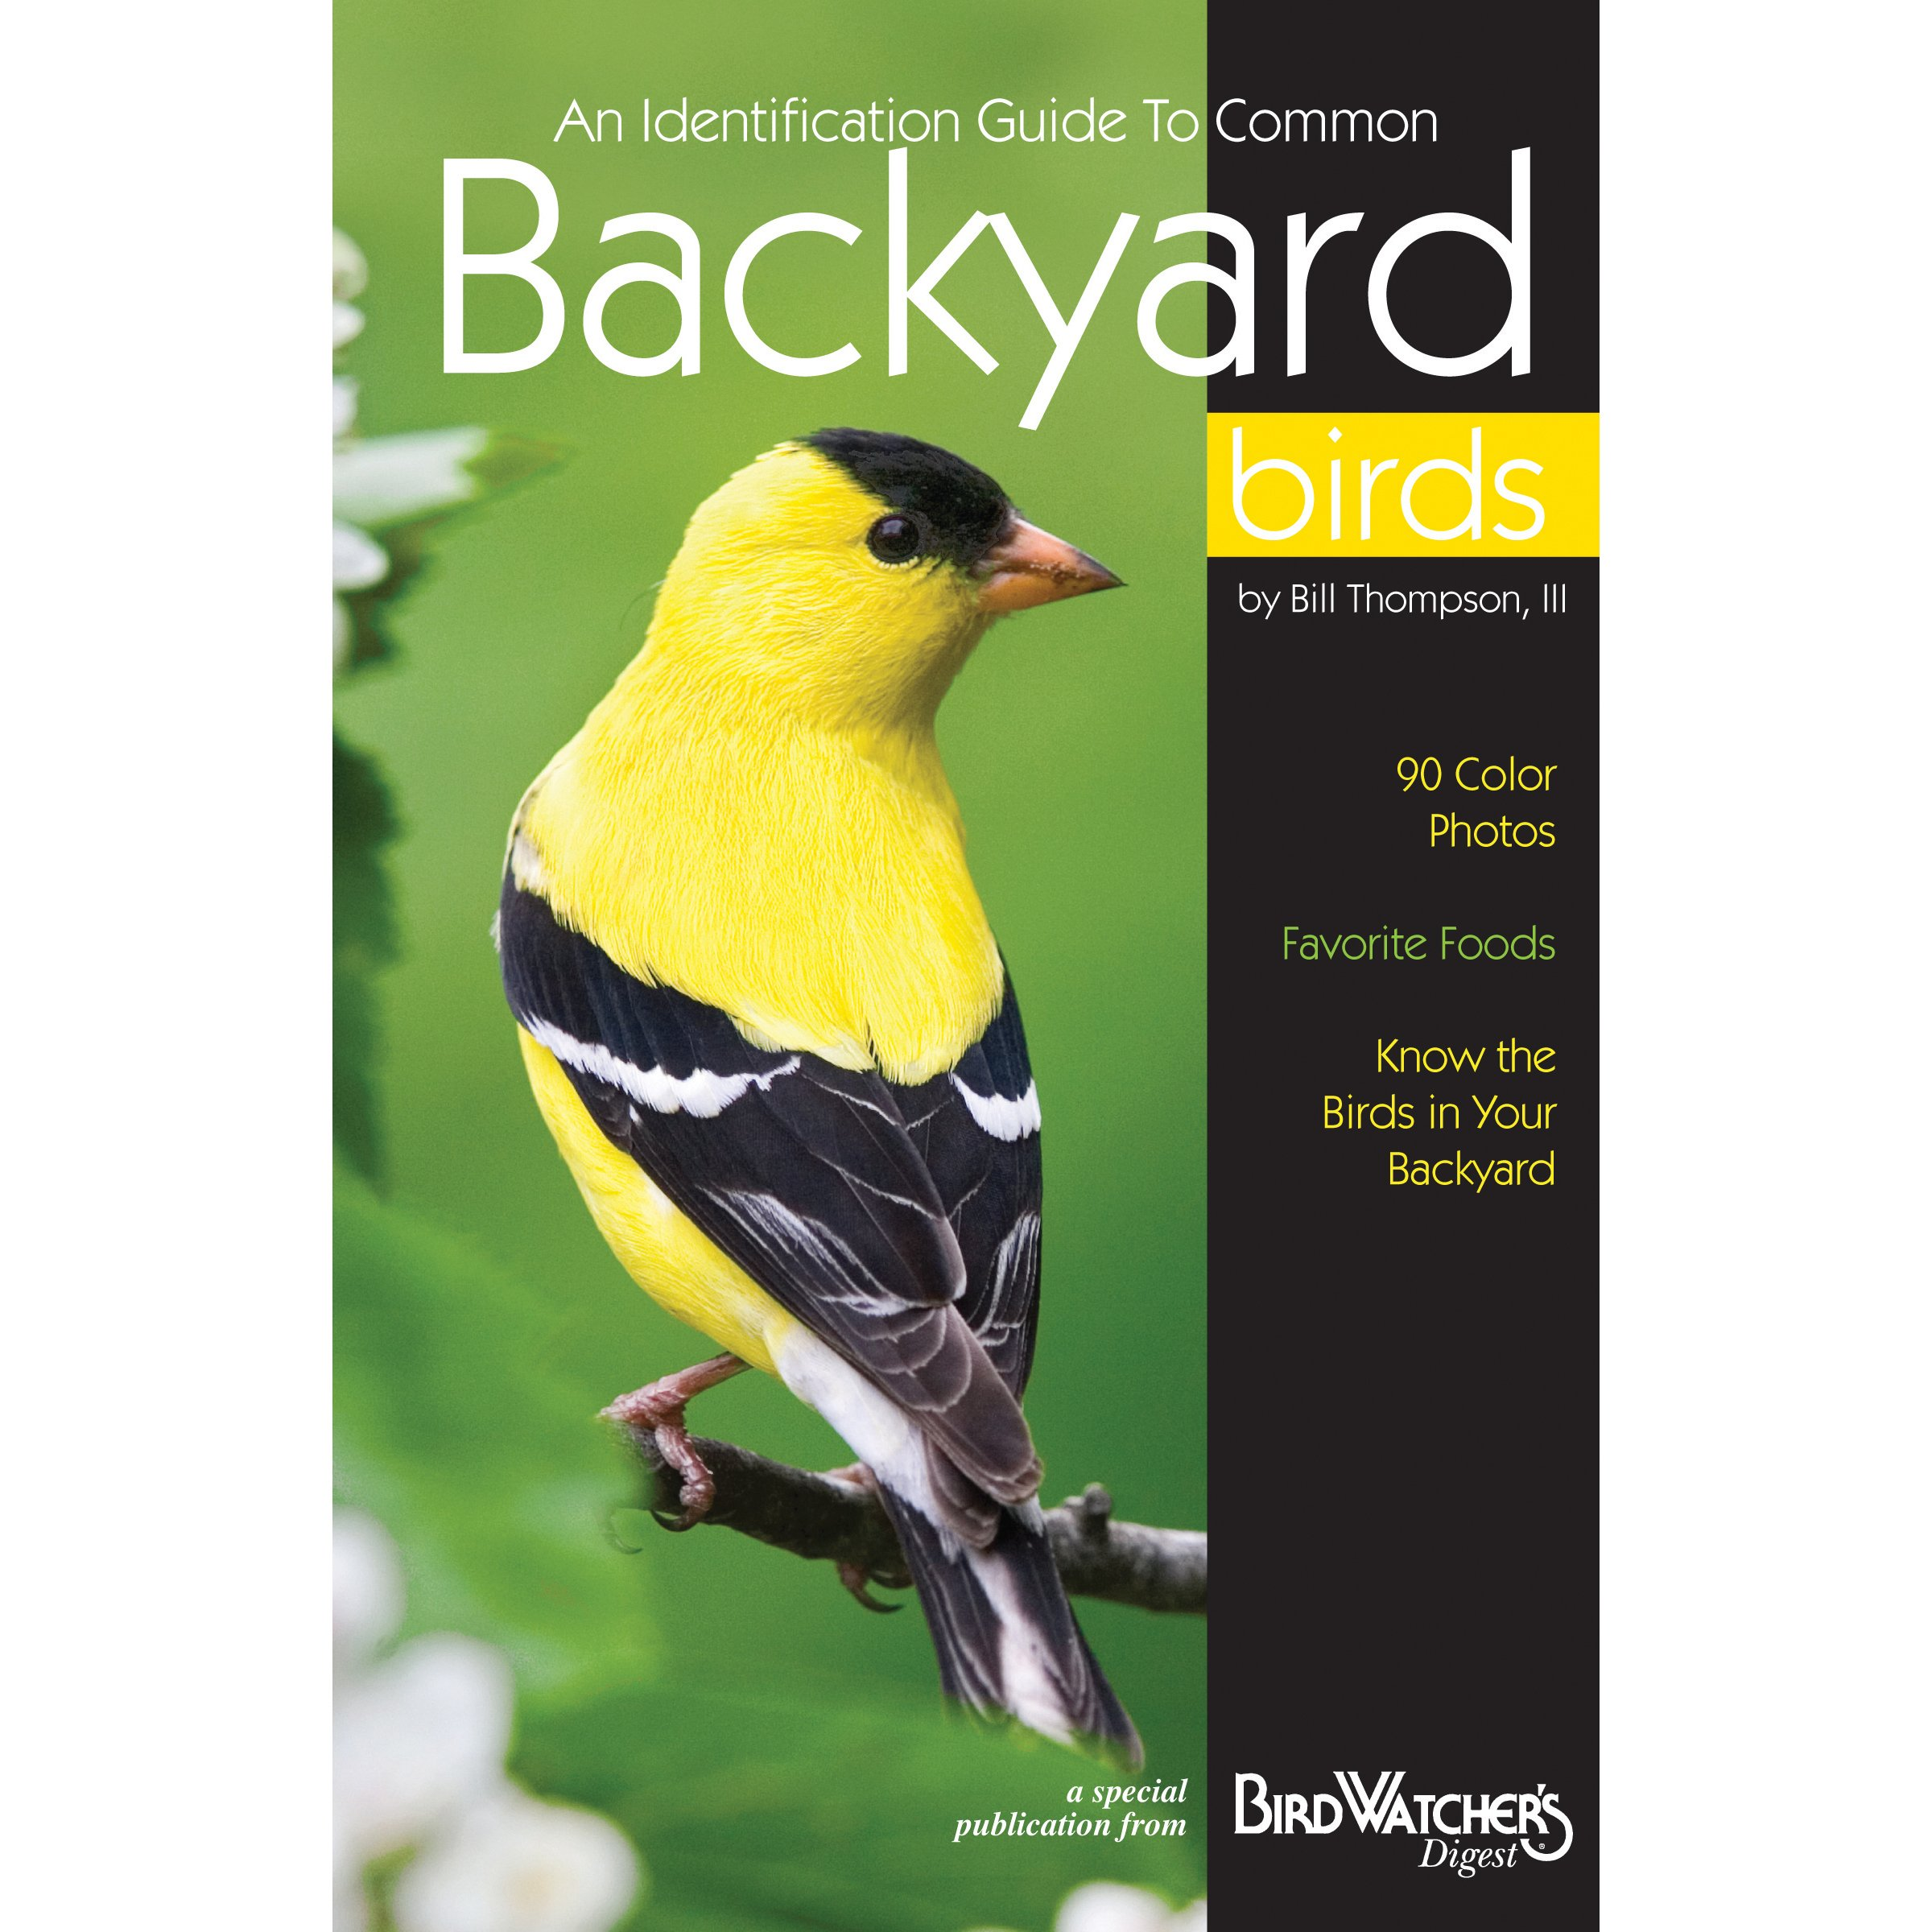 Bird Watchers Digest 345 An Identification Guide to Common Backyard Birds